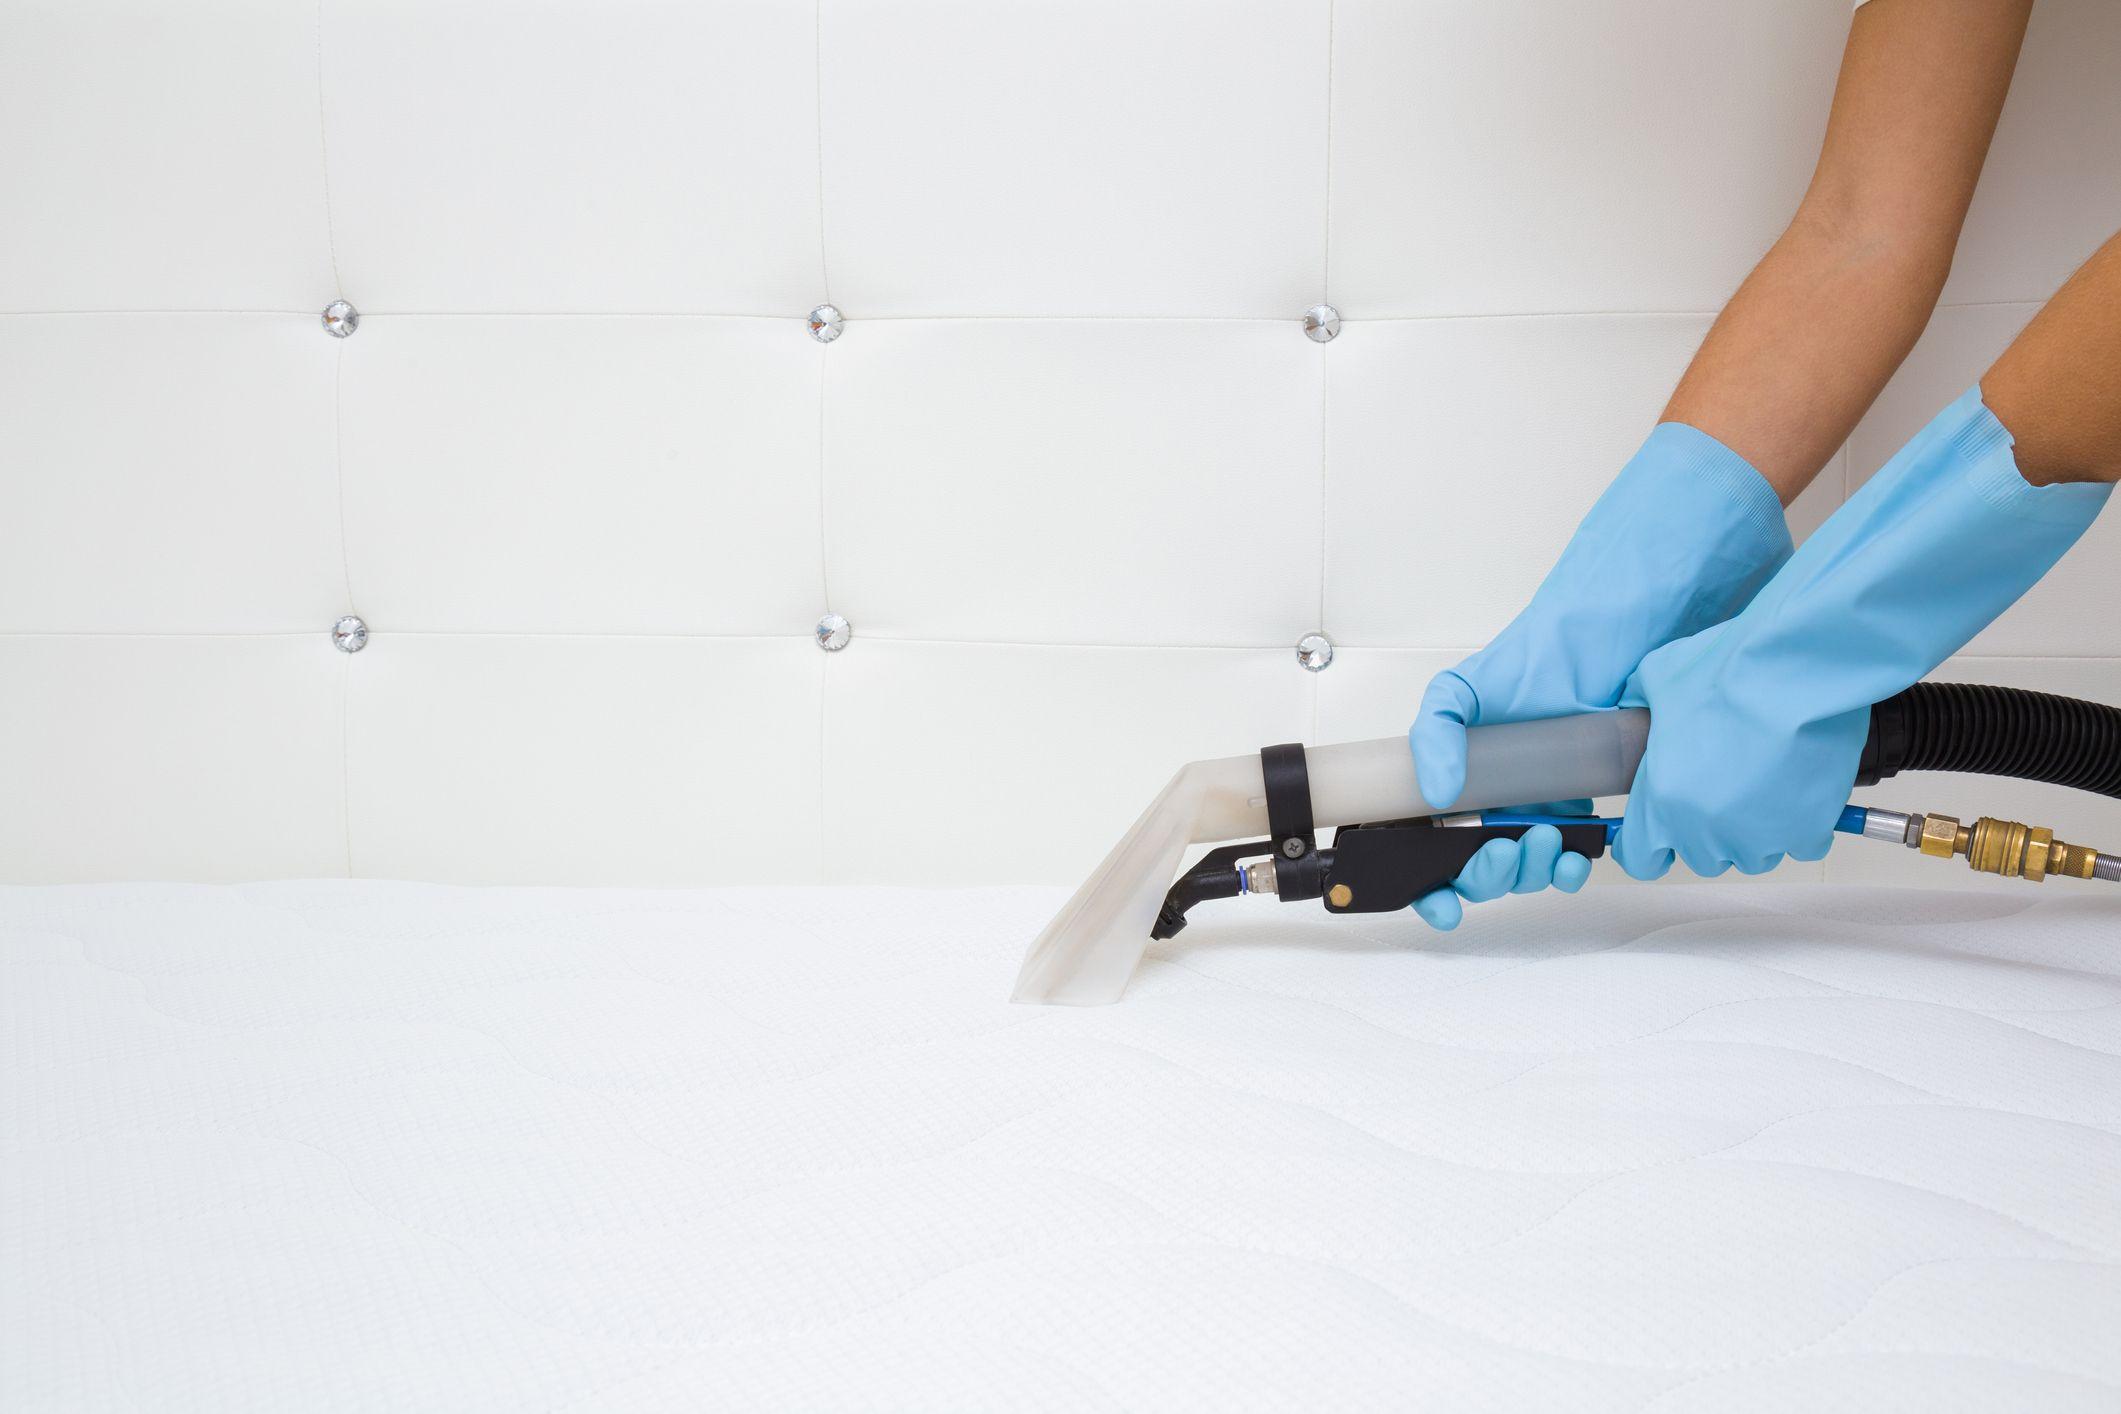 How to Clean a Mattress - Best Mattress Cleaning Tips